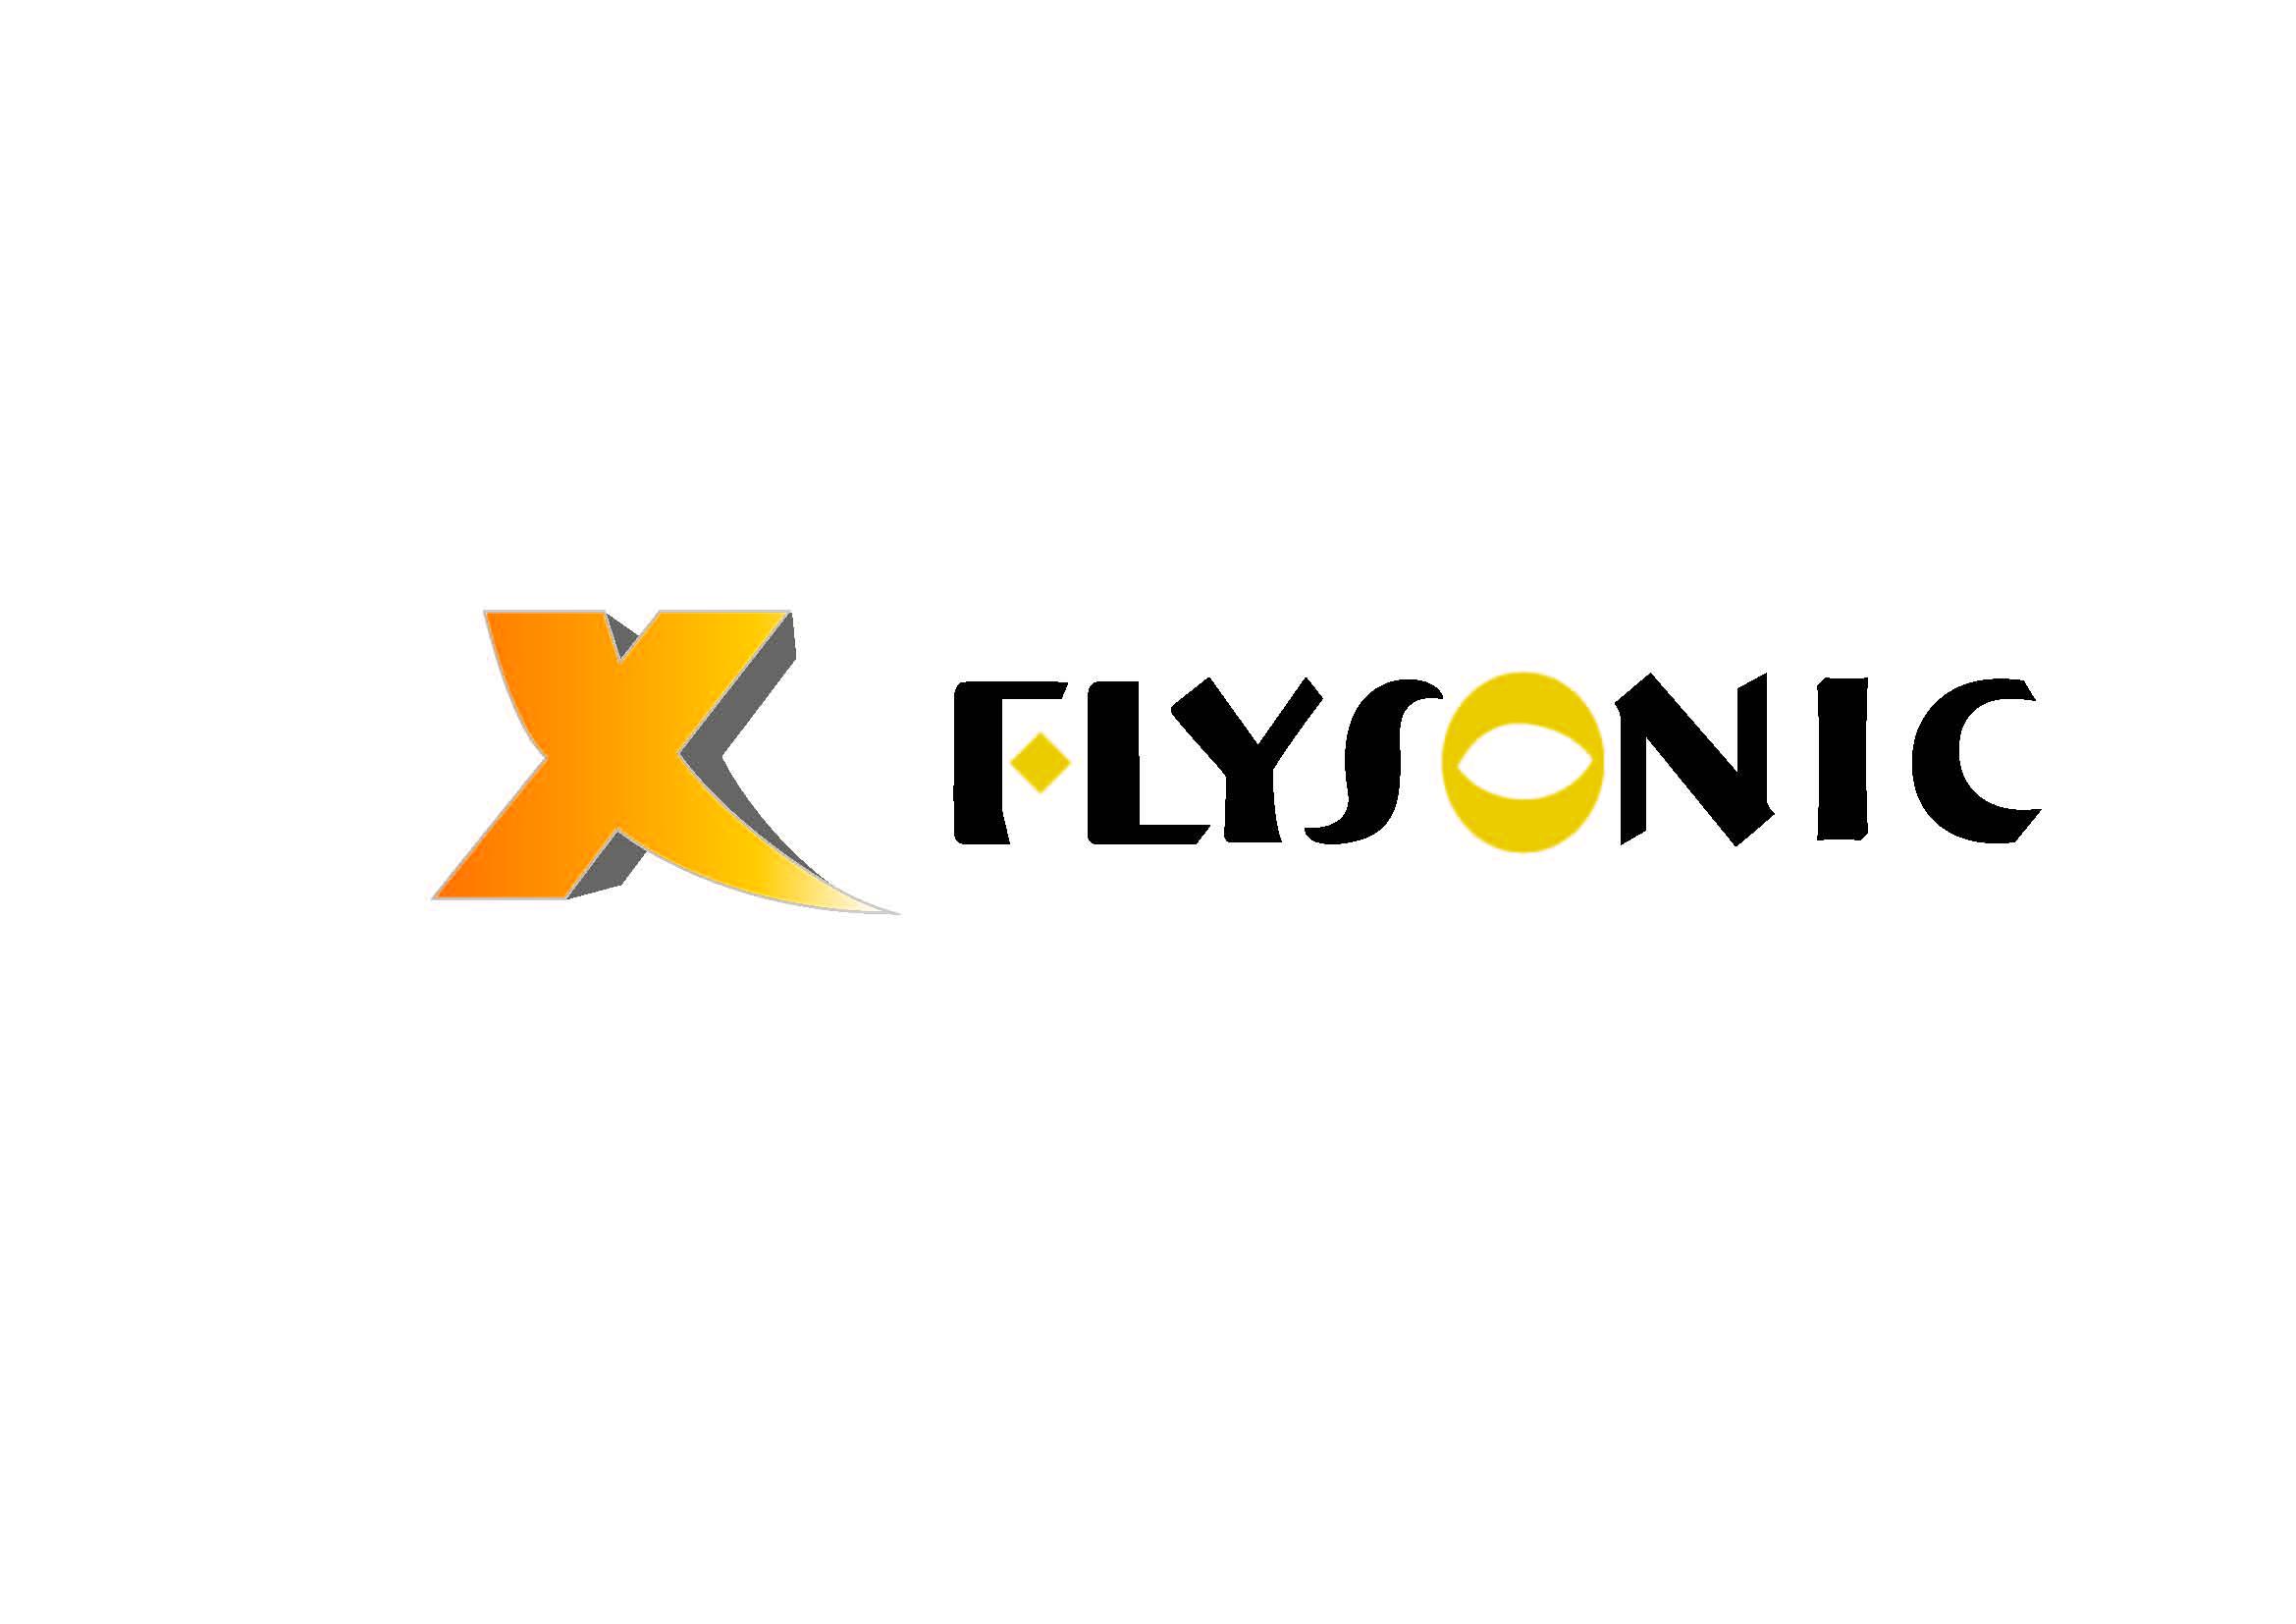 Dongguan Flysonic Electronics Co., Ltd